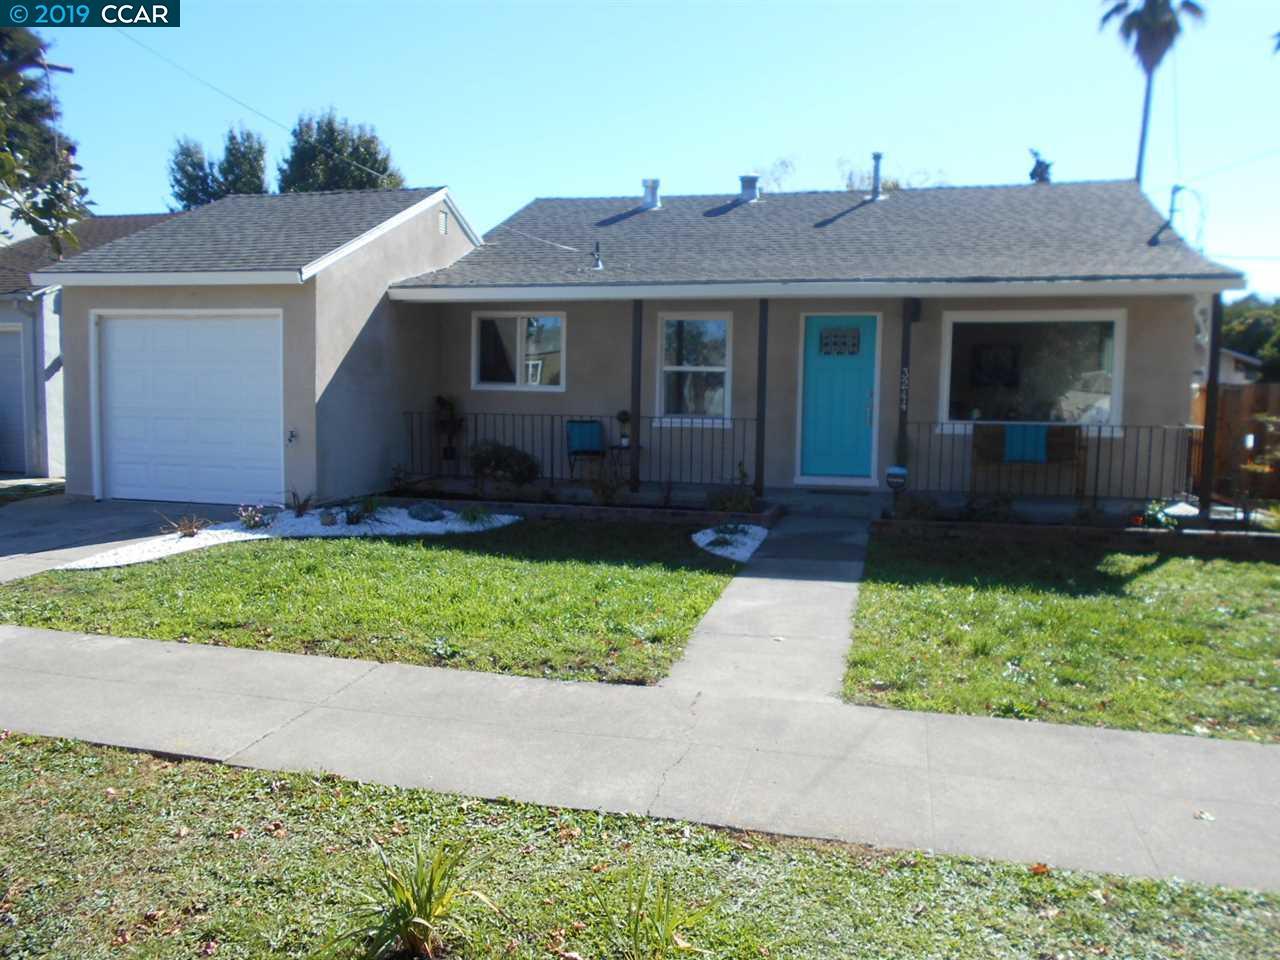 3244 HUMPHREY AVE, RICHMOND, CA 94804